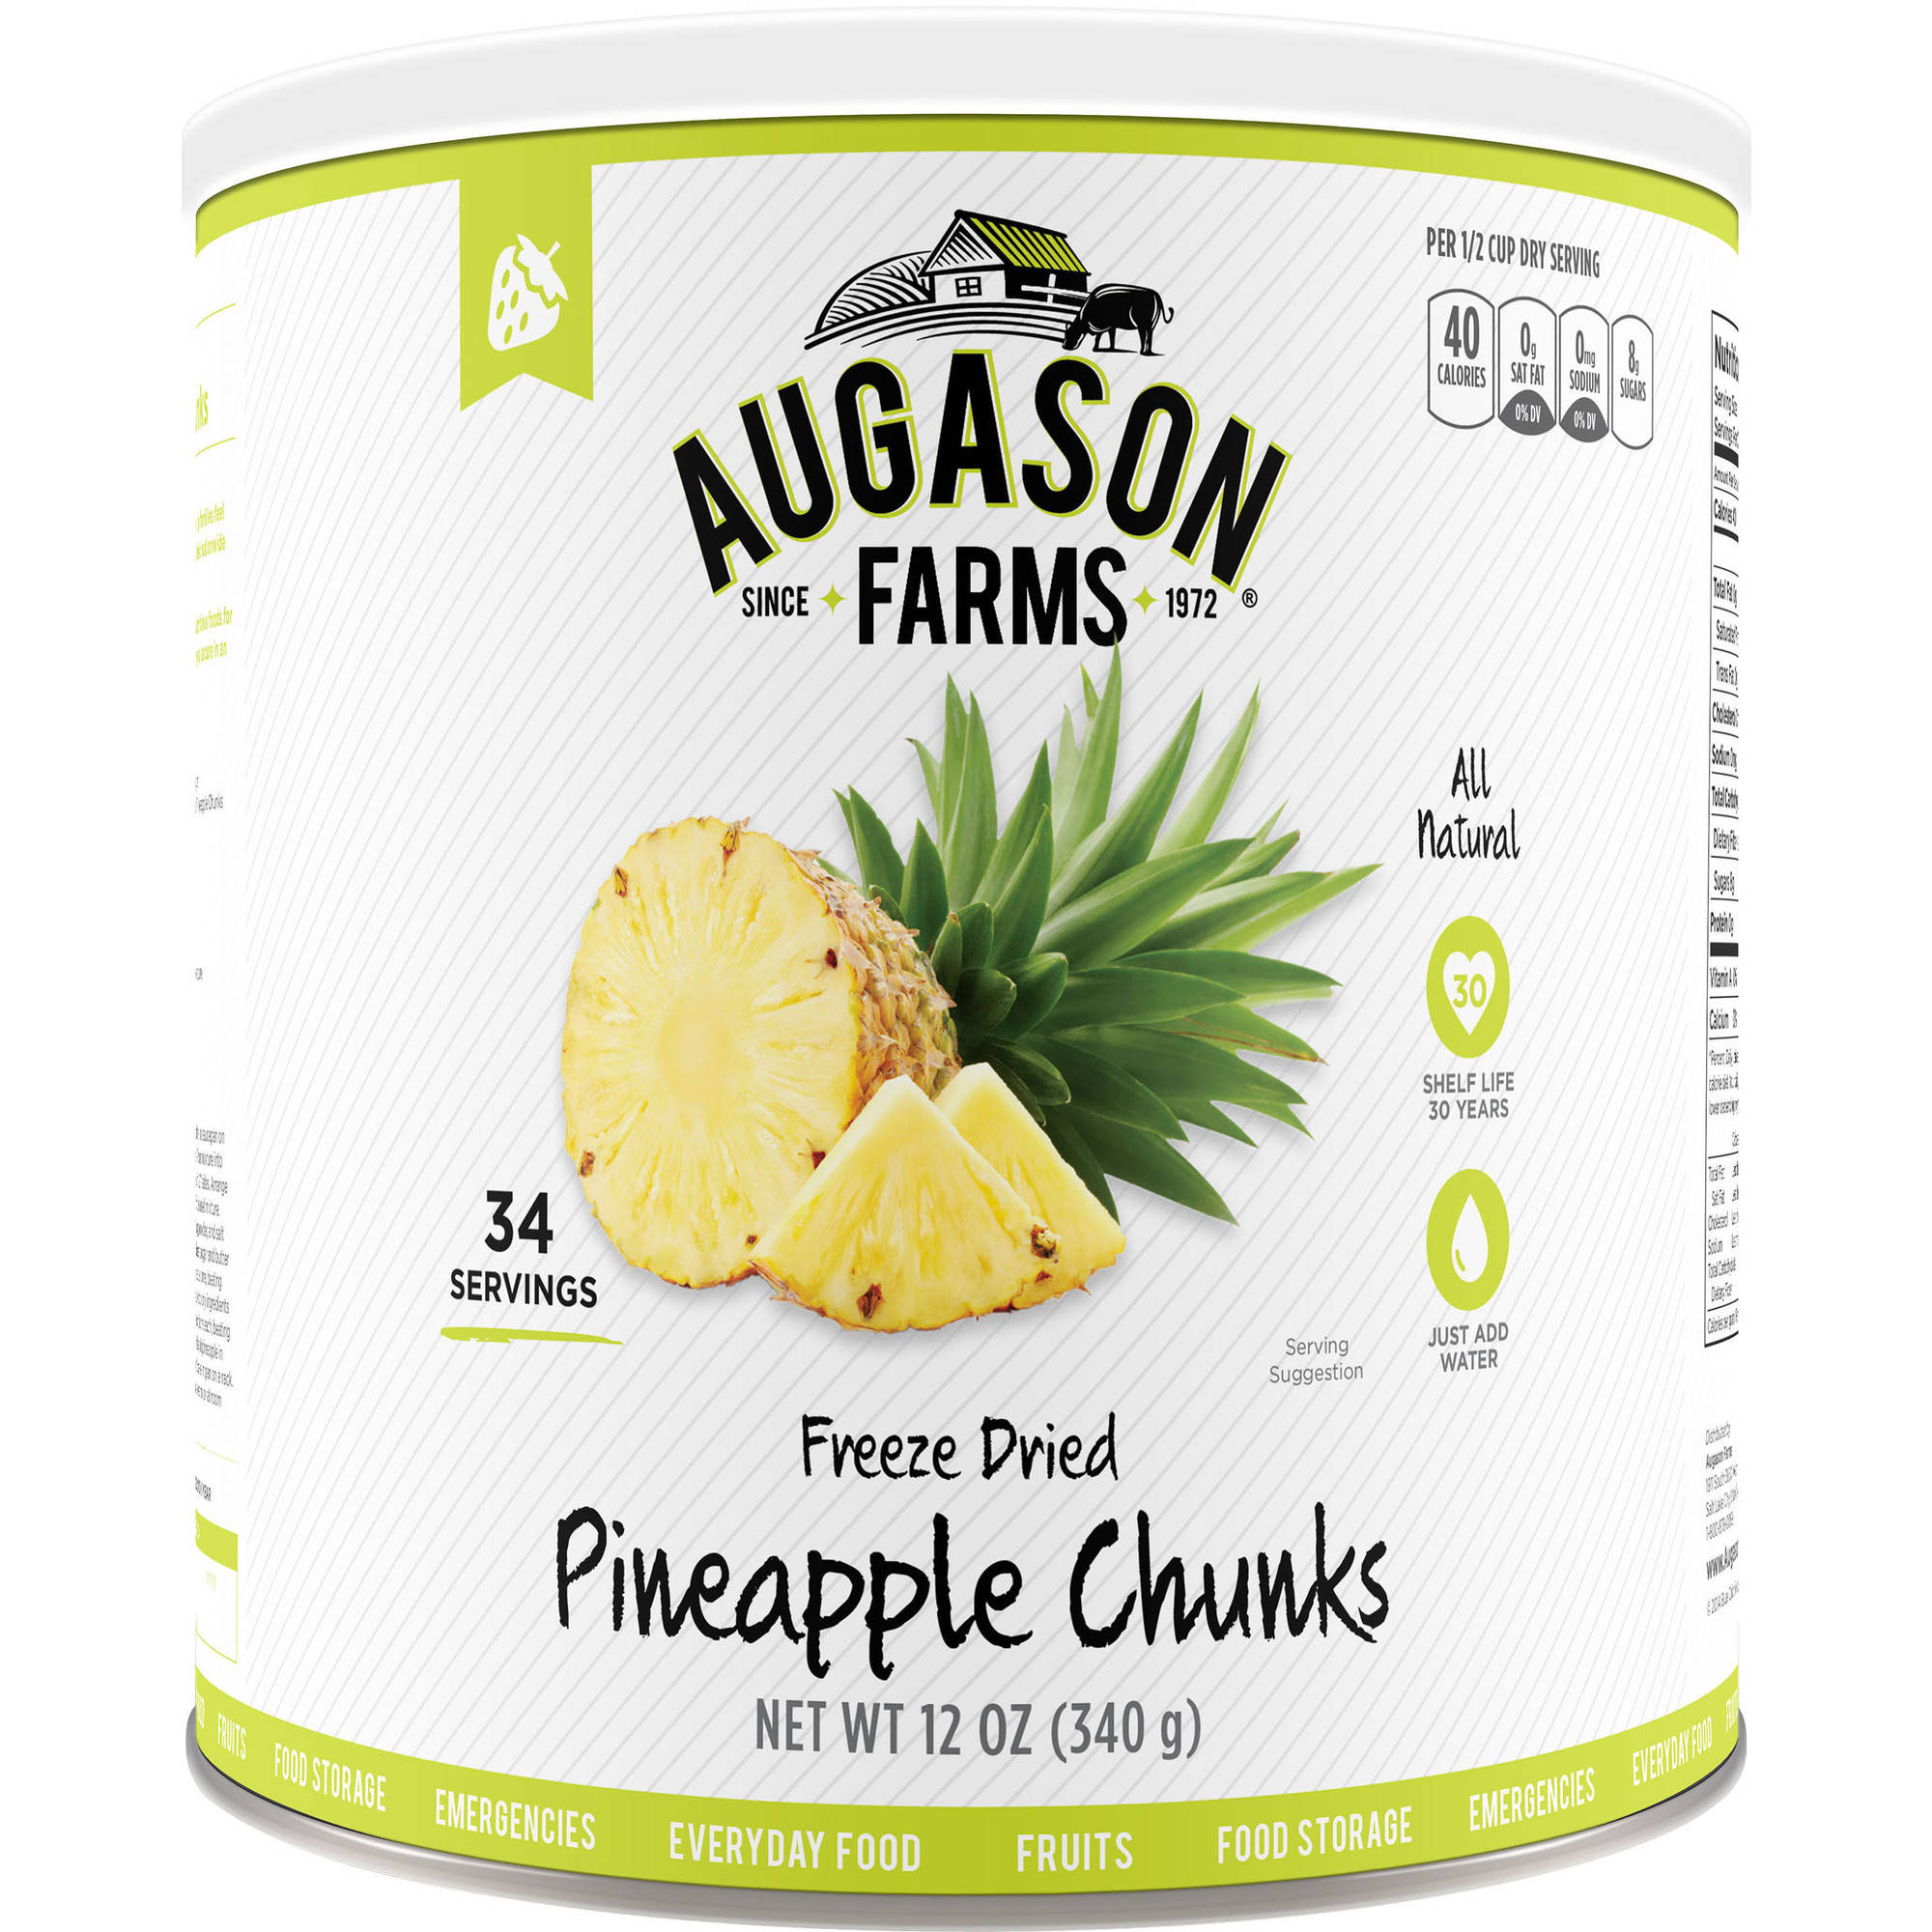 Augason Farms Emergency Food Freeze-Dried Pineapple Chunks, 12 oz